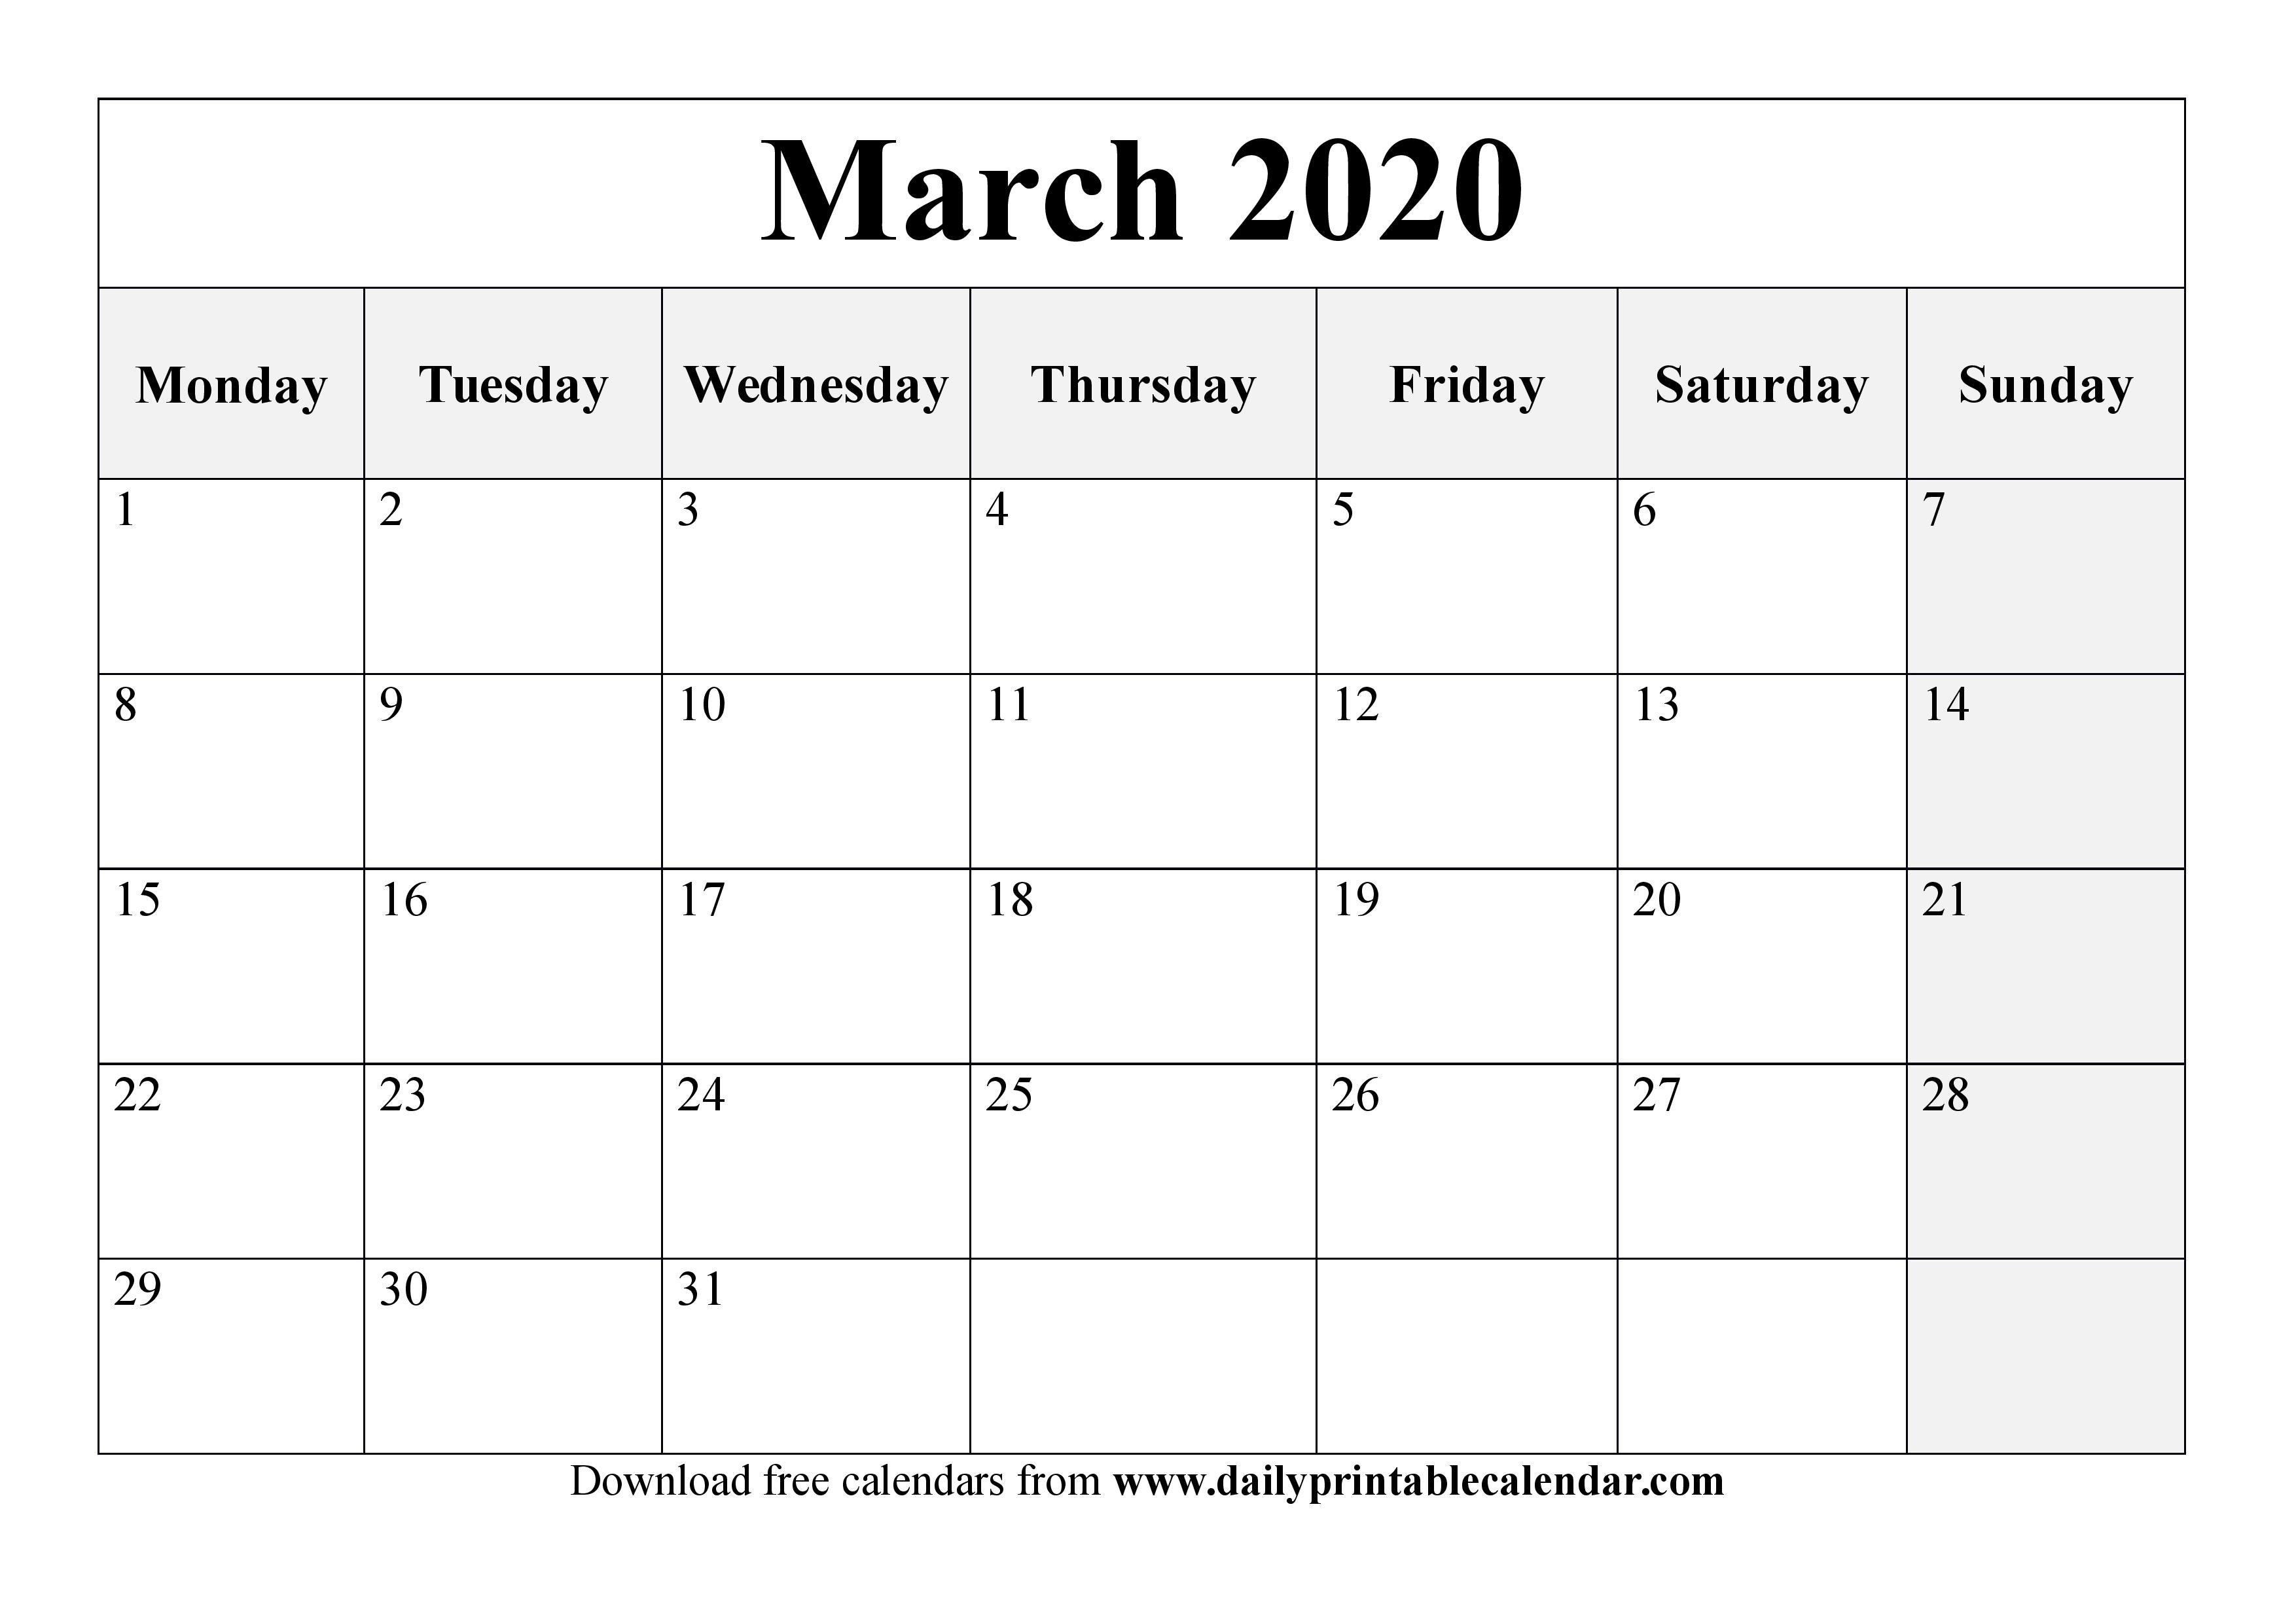 Printable March 2020 Calendar Template - Free Calendars Calendar You Can Edit Free